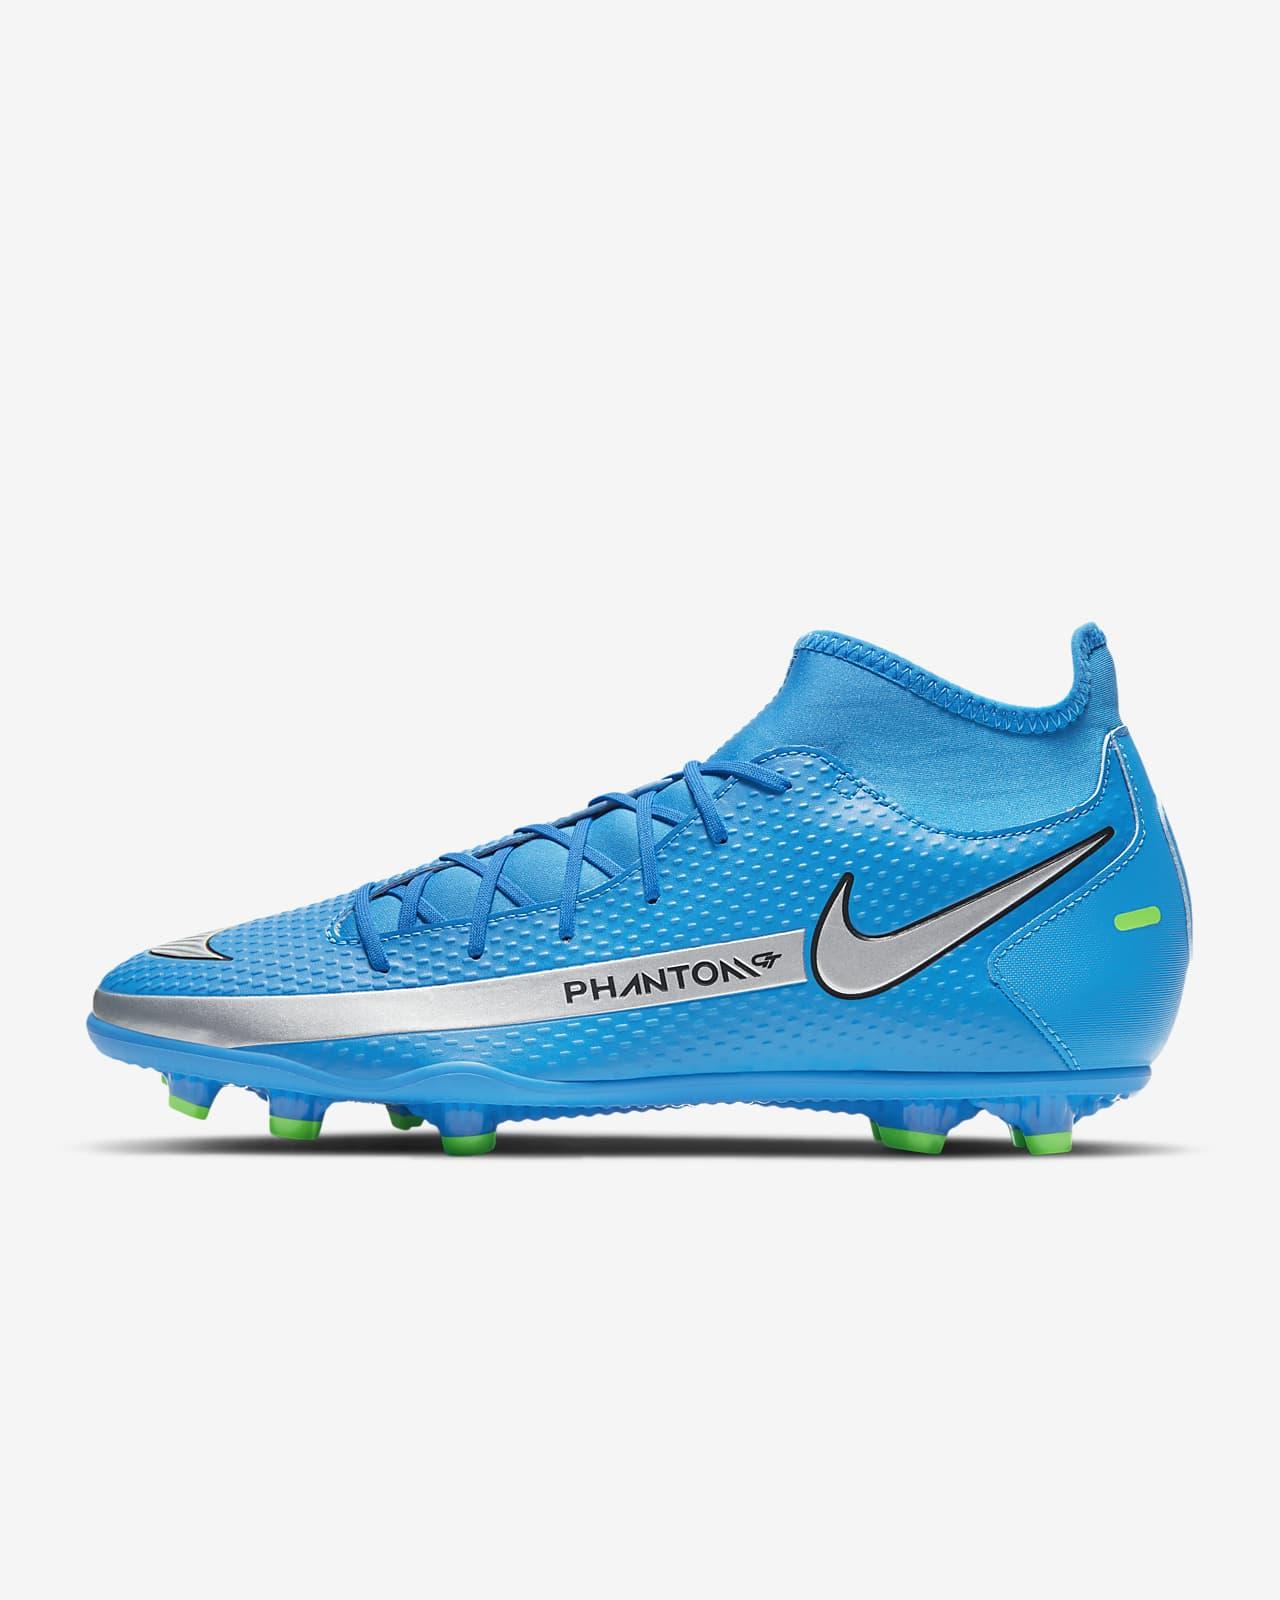 Nike Phantom GT Club Dynamic Fit MG Multi-Ground Football Boot